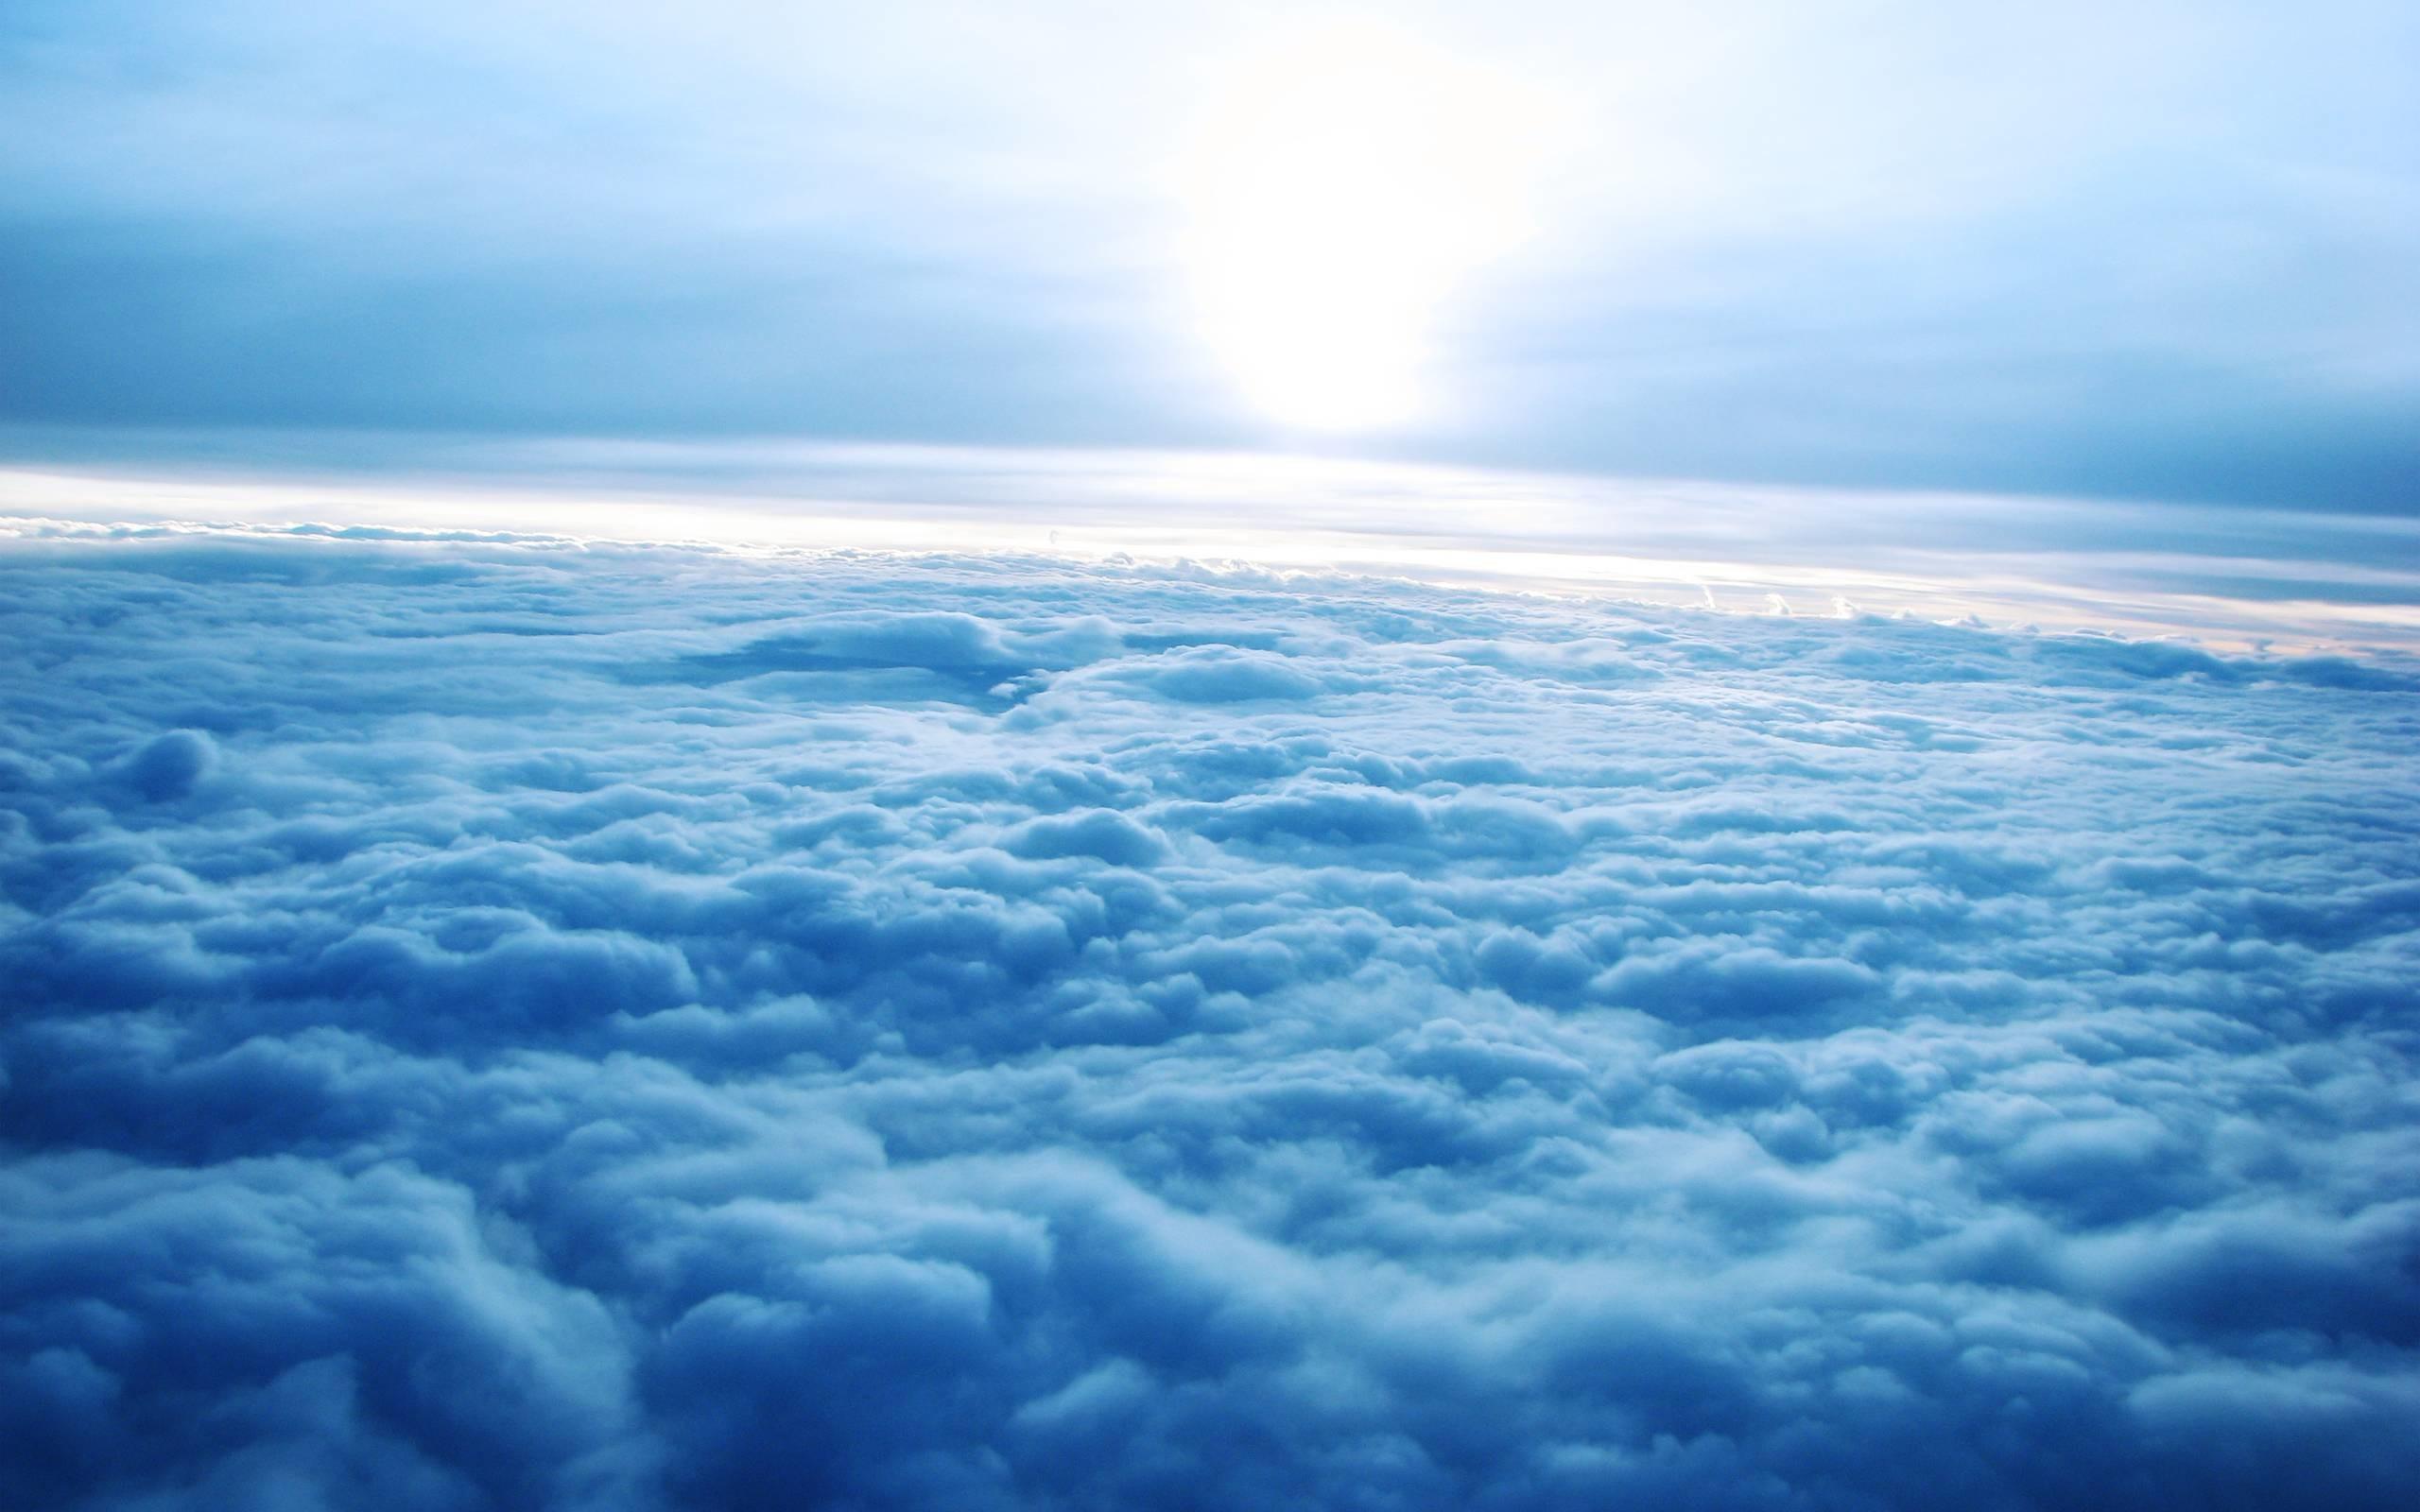 cloud wallpapers | cloud wallpapers